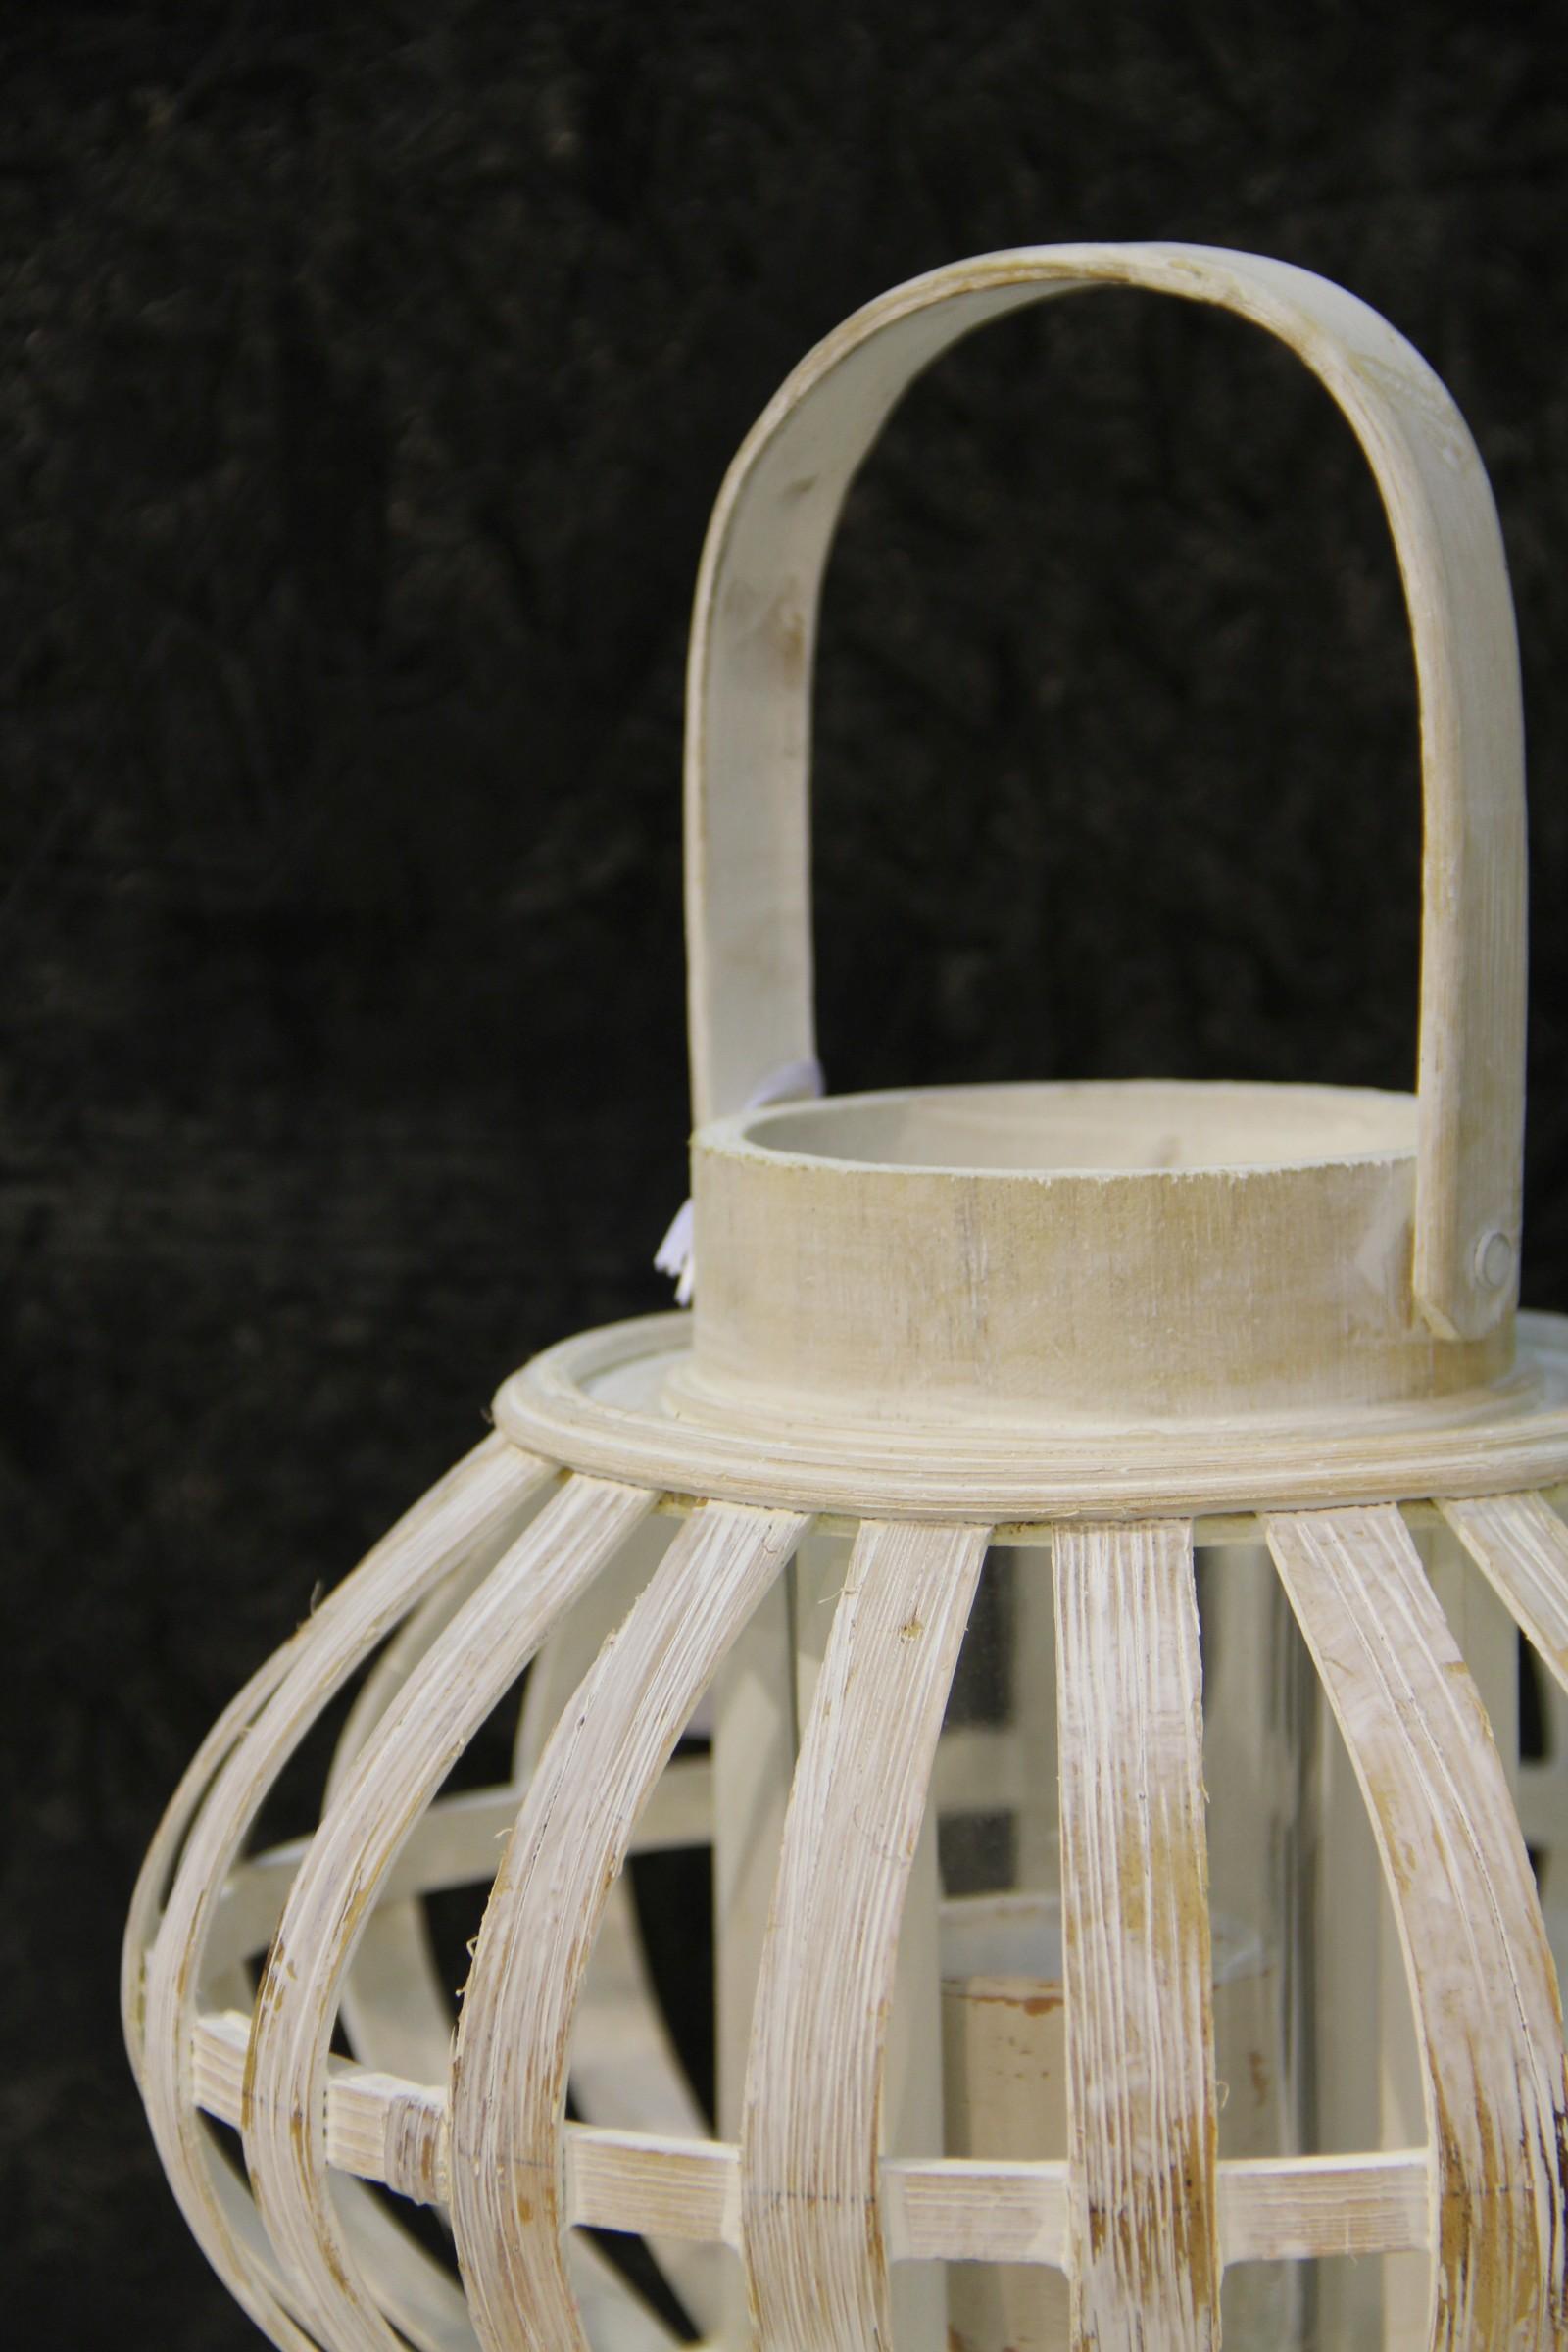 bambus laterne holz rustikal shabby mittel klein rund. Black Bedroom Furniture Sets. Home Design Ideas